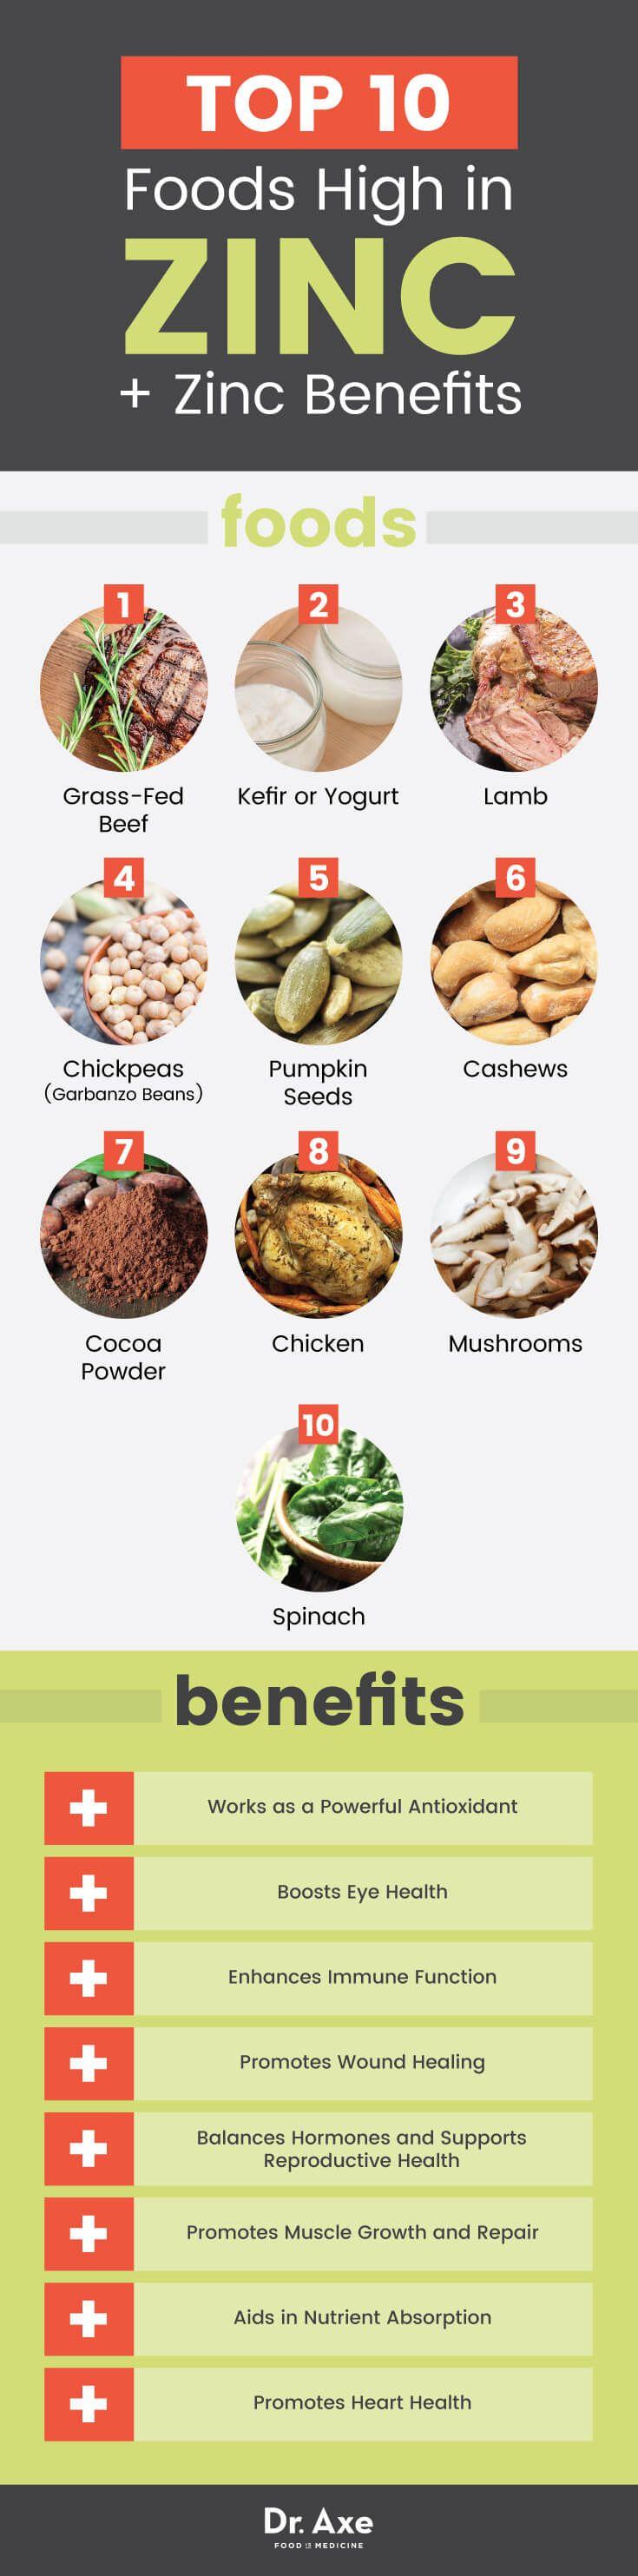 Top 15 Foods High in Zinc Foods high in zinc, Food, Zinc